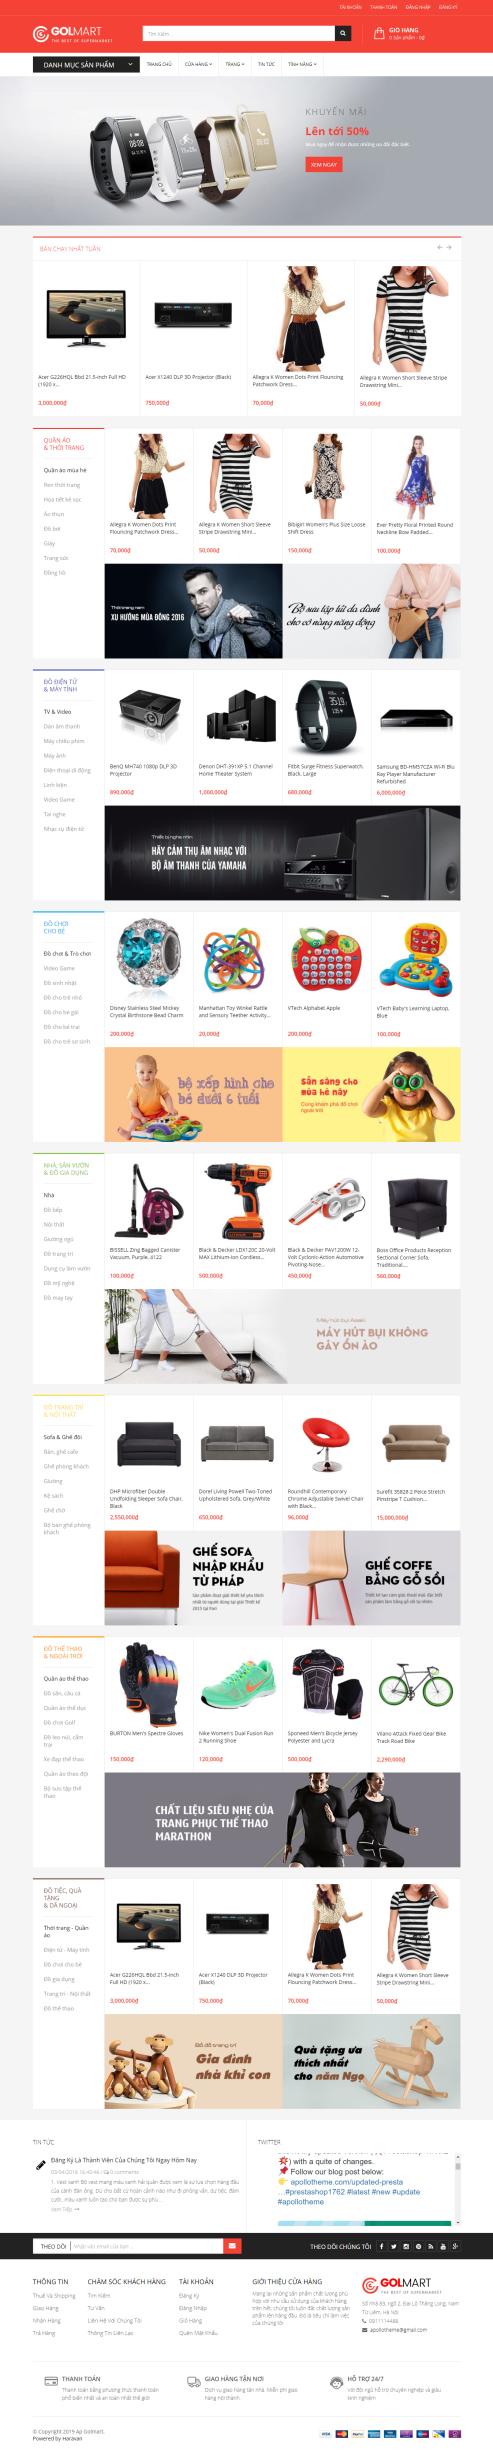 Thiết kế Mẫu website siêu thị 10